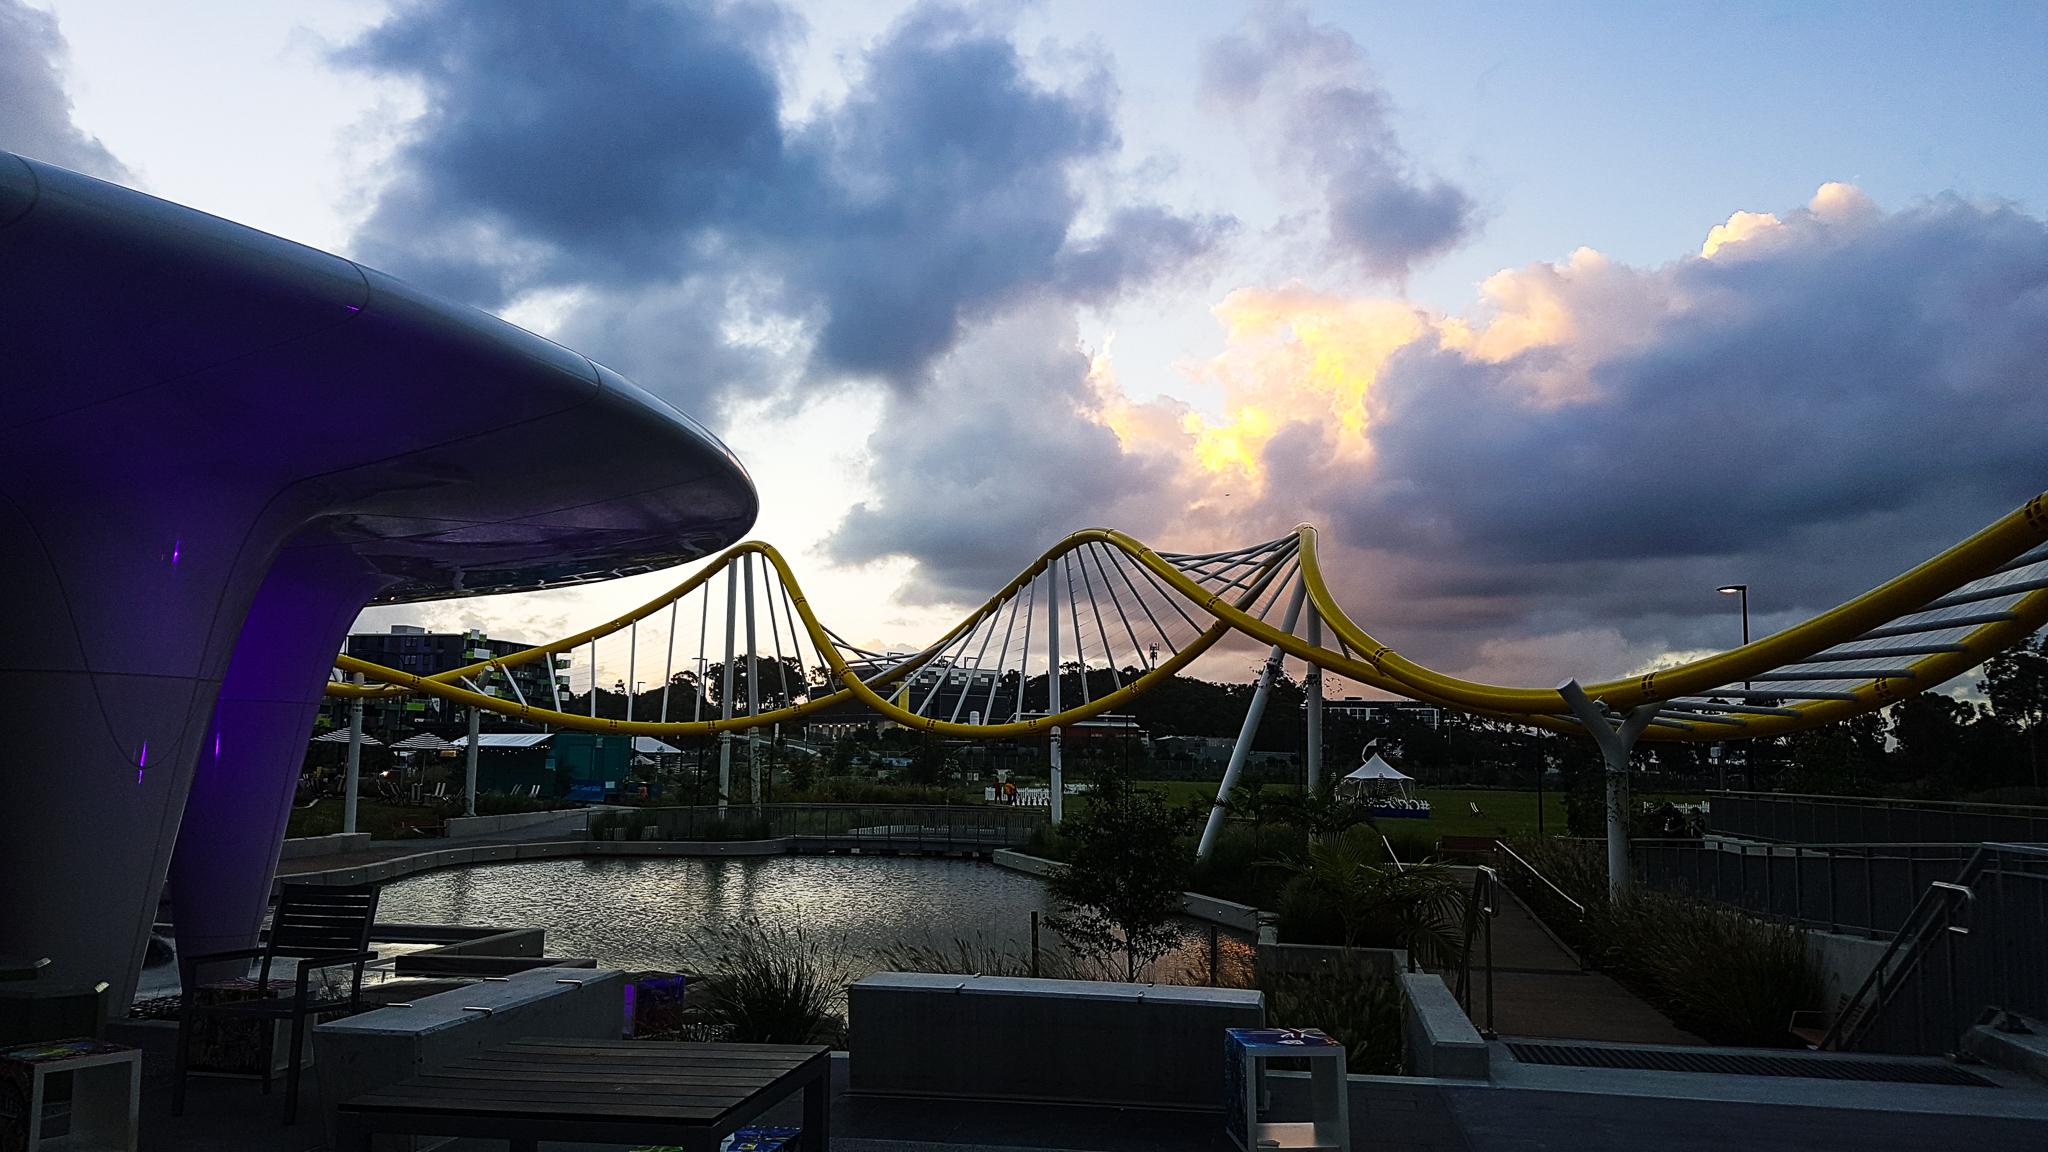 Twilight shot of Gold Coast Athlete's Village